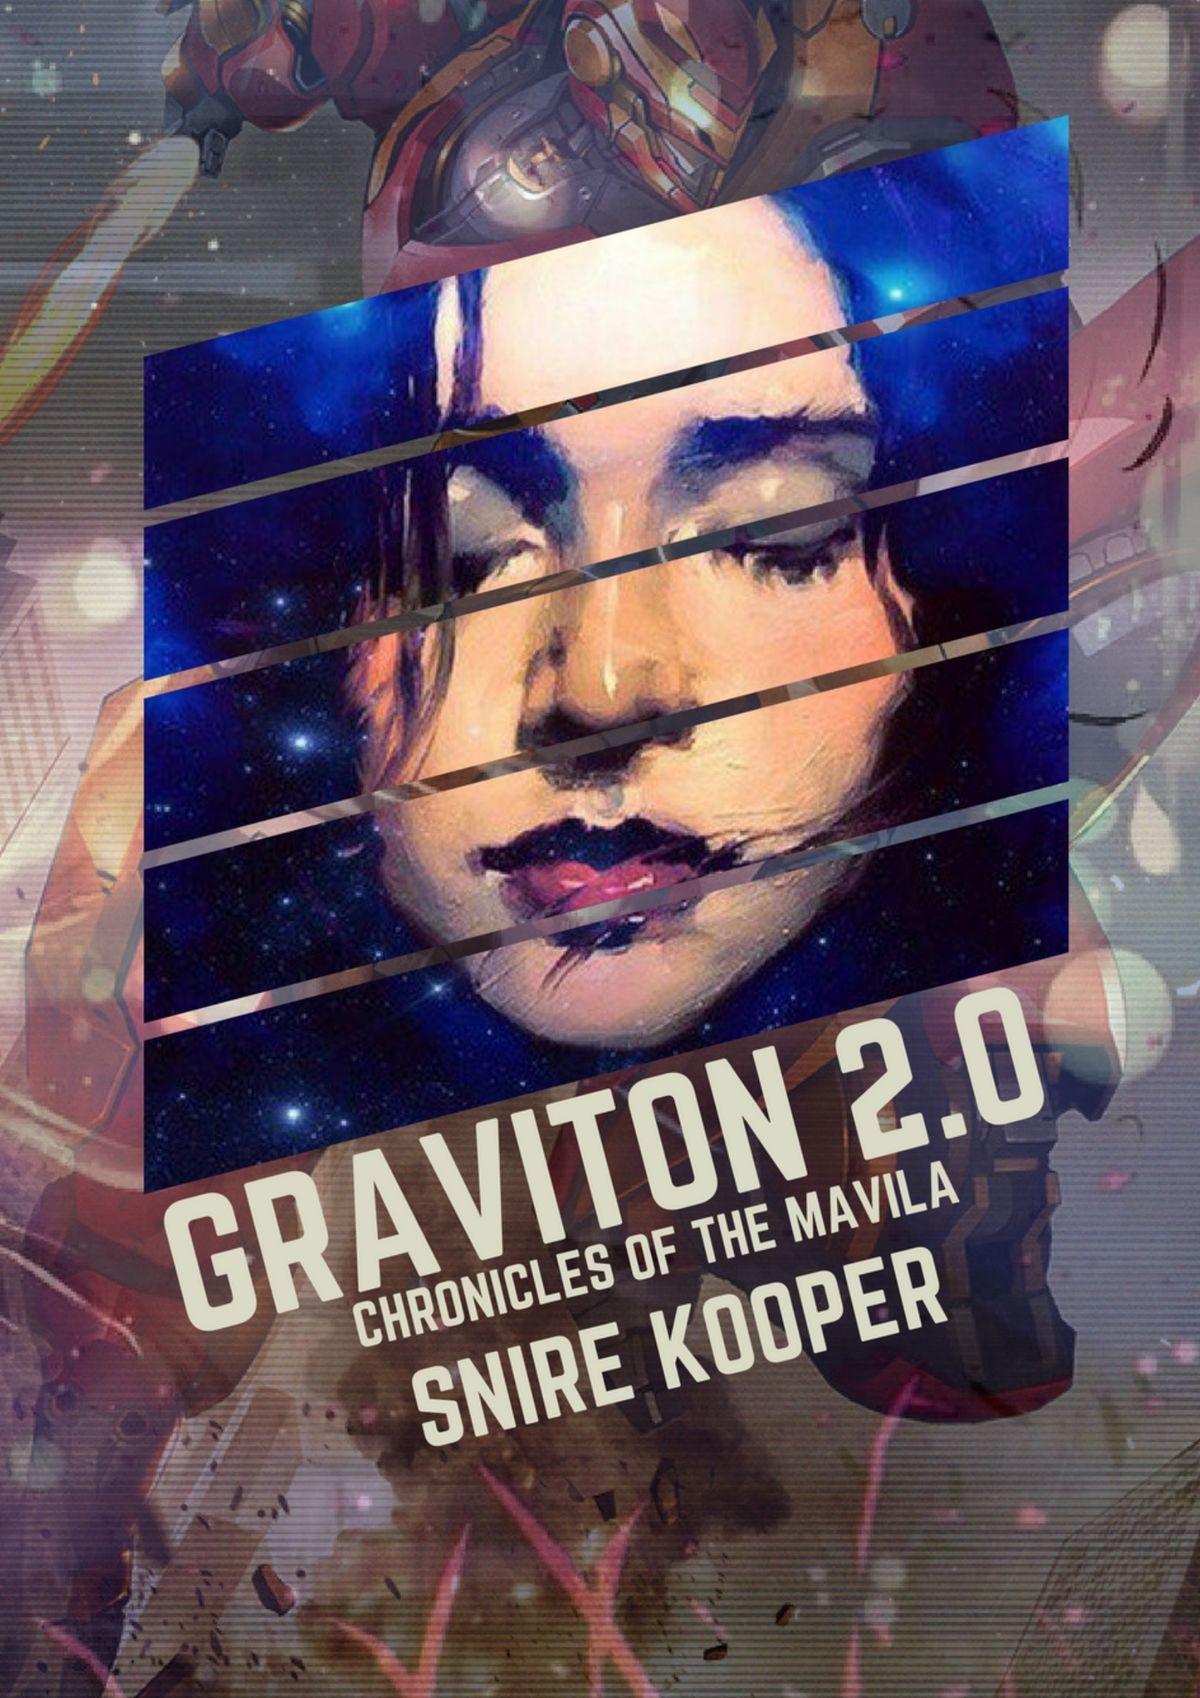 Graviton 2.0_Snire Synnister Kooper